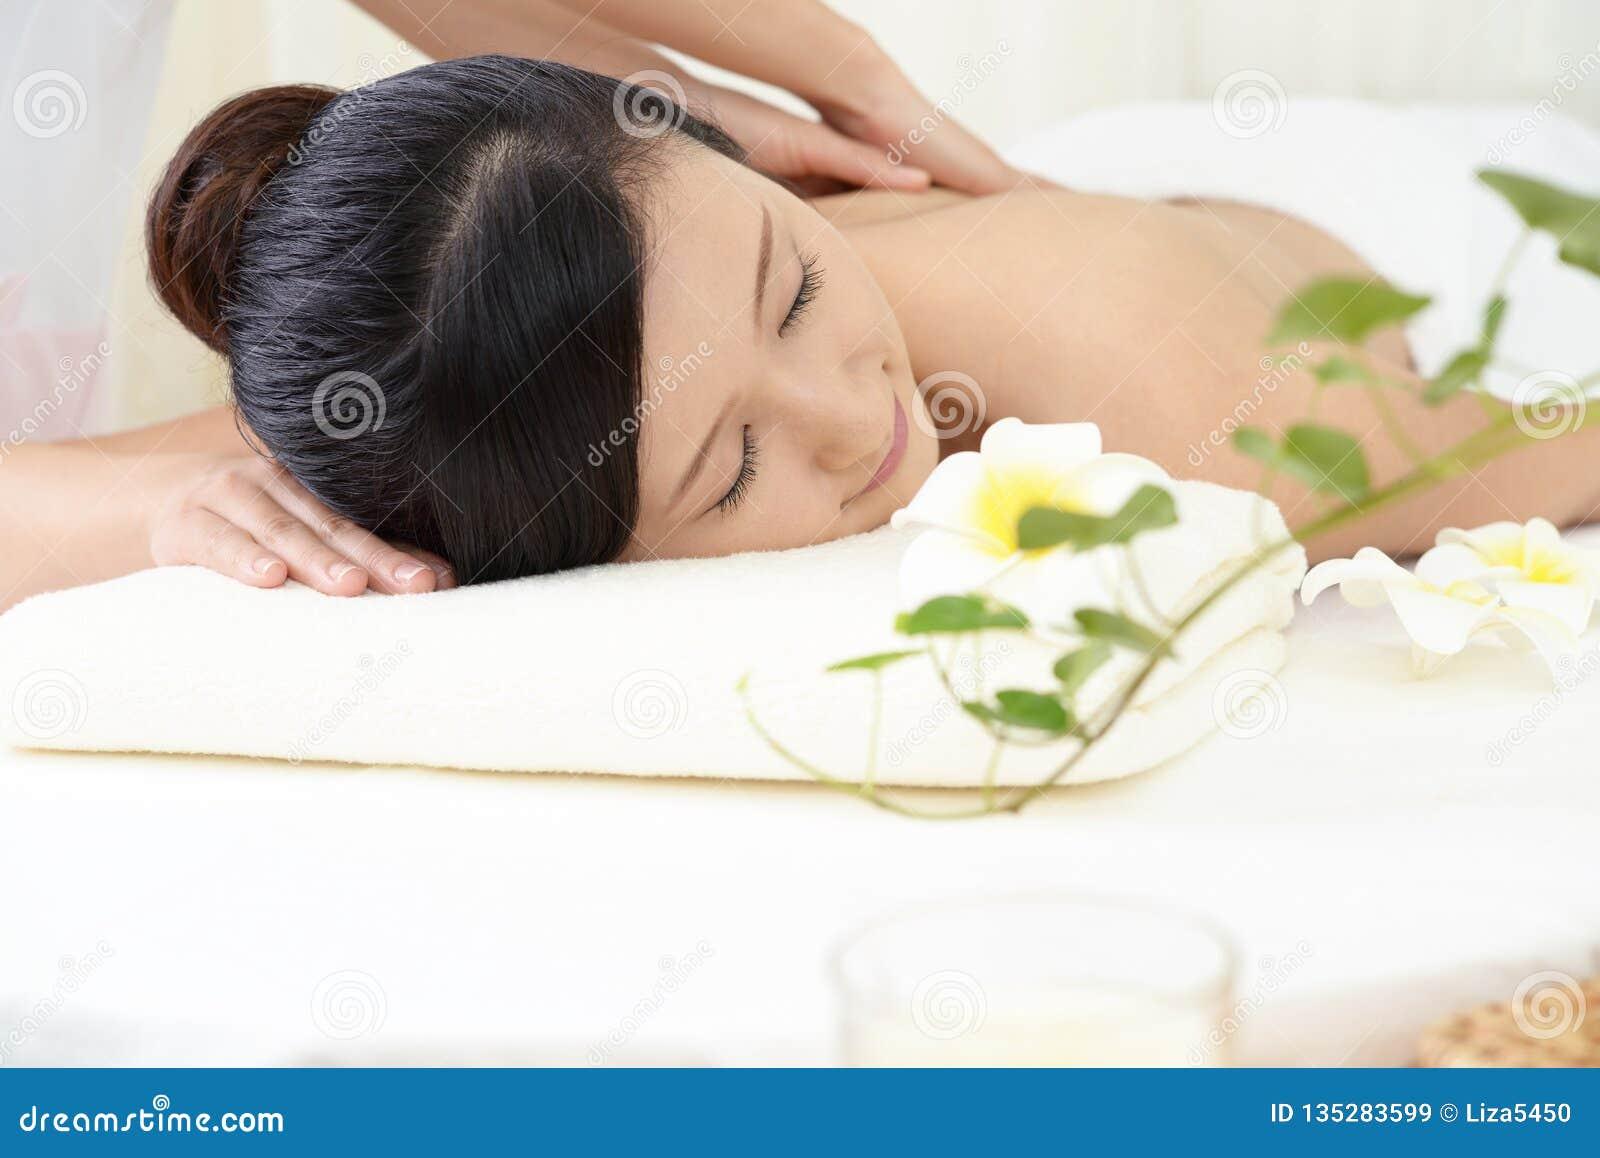 Woman Receives Body Massage At Spa Salon Stock Image ...